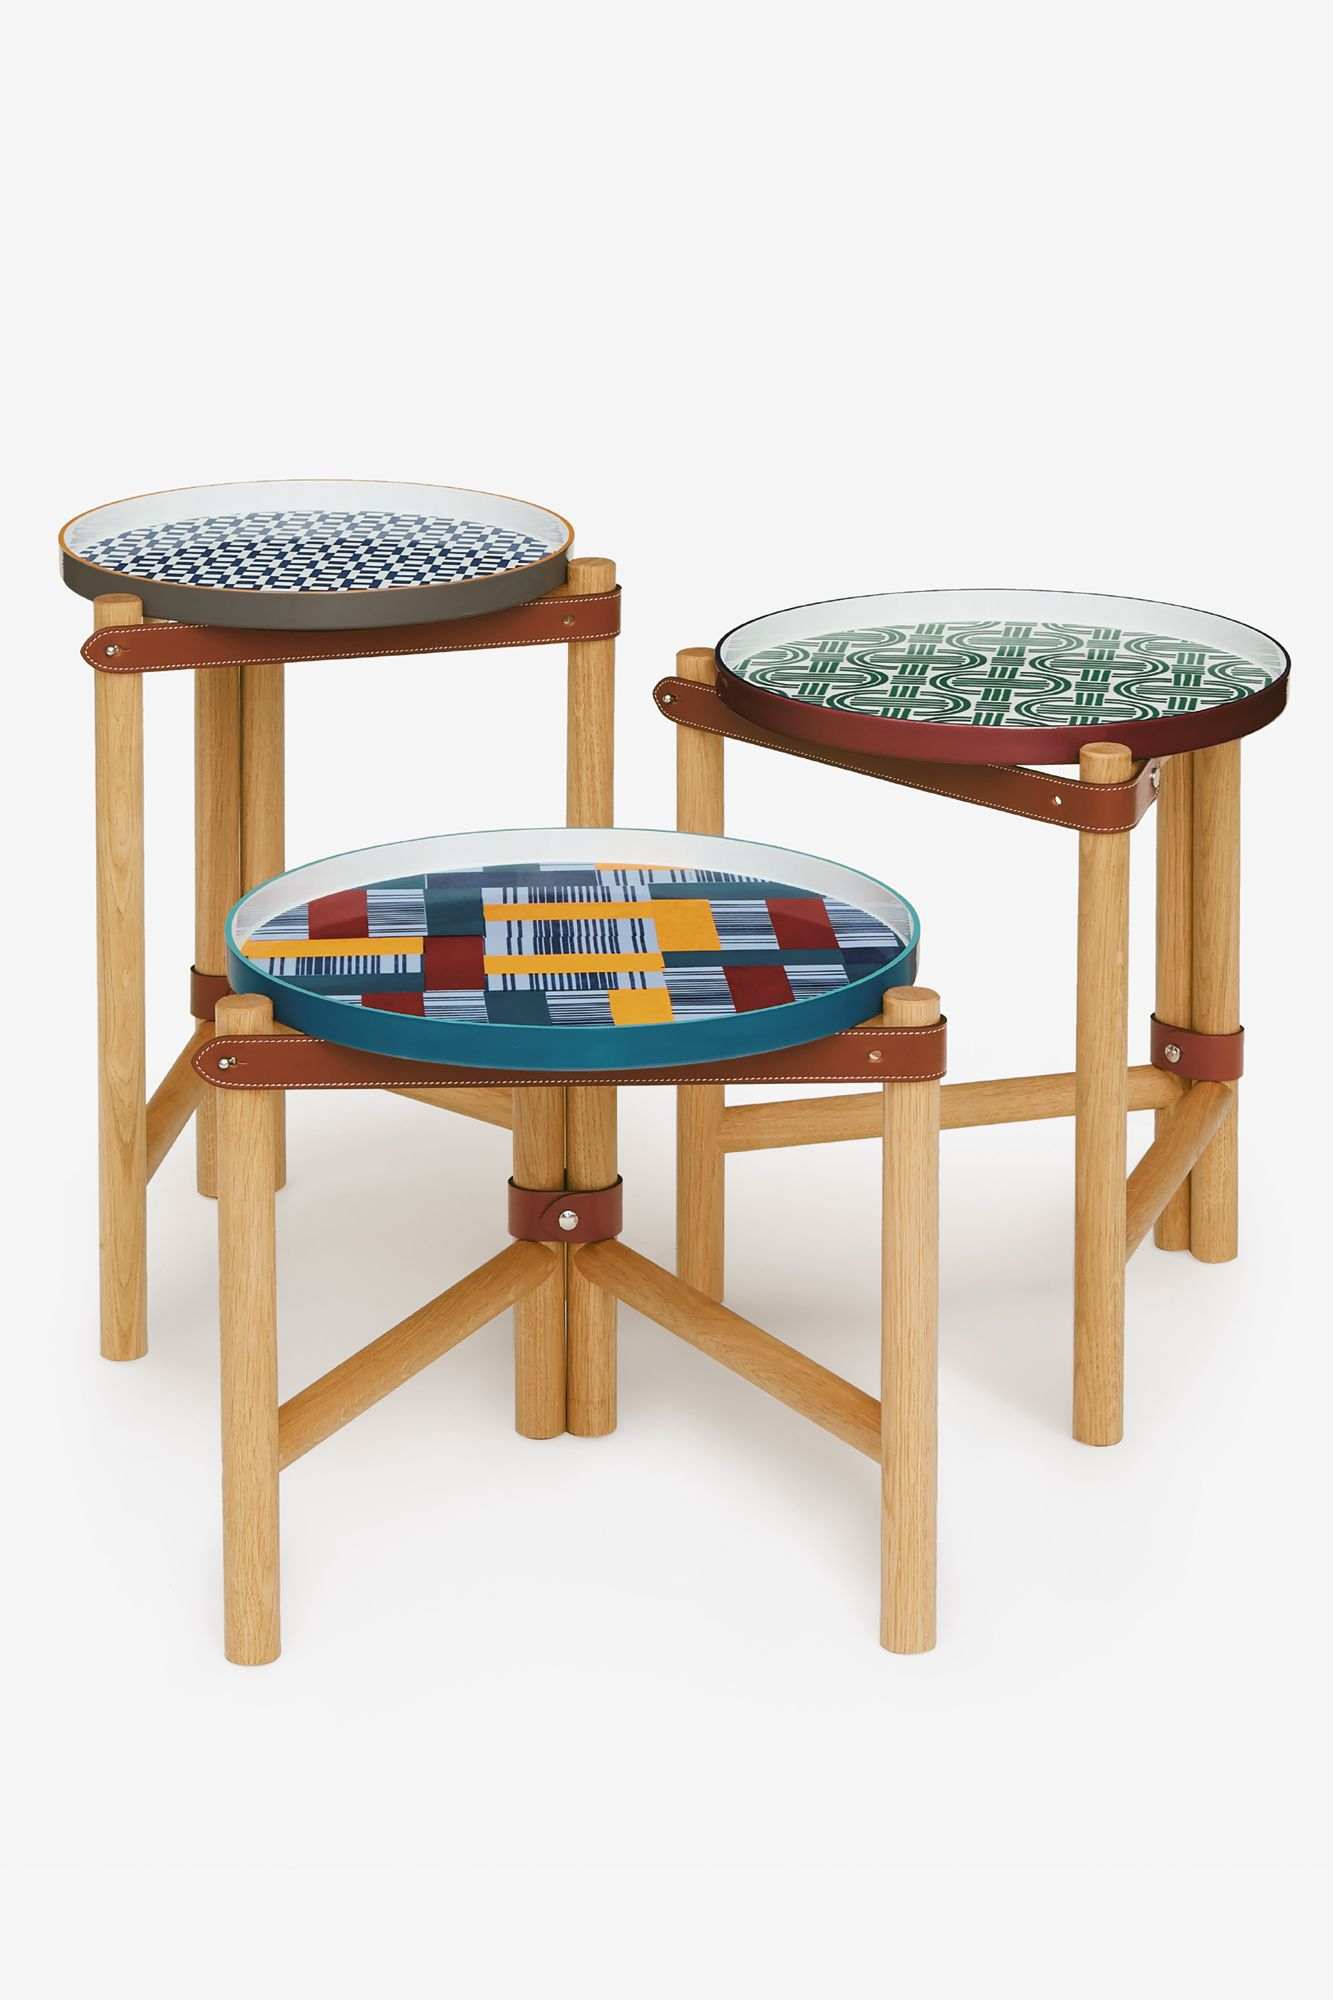 Les Trotteuses d'Hermès occasional tables, from Hermès